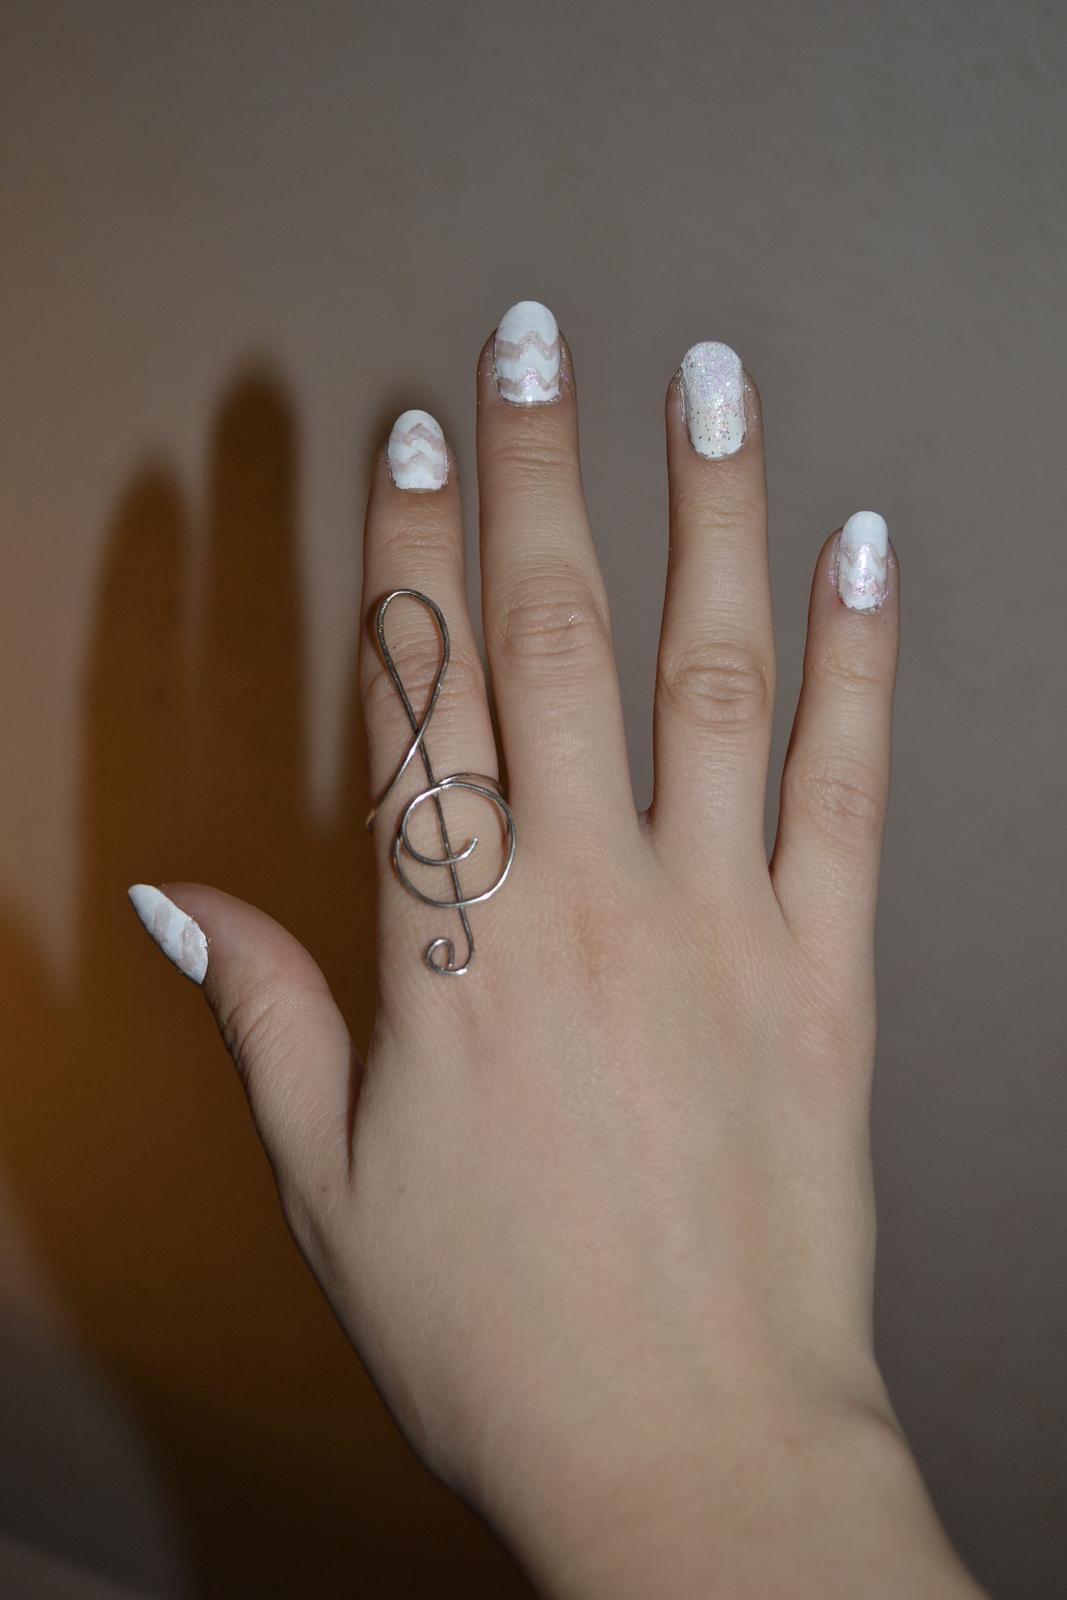 Chevron Nails · How To Paint Patterned Nail Art · Nail